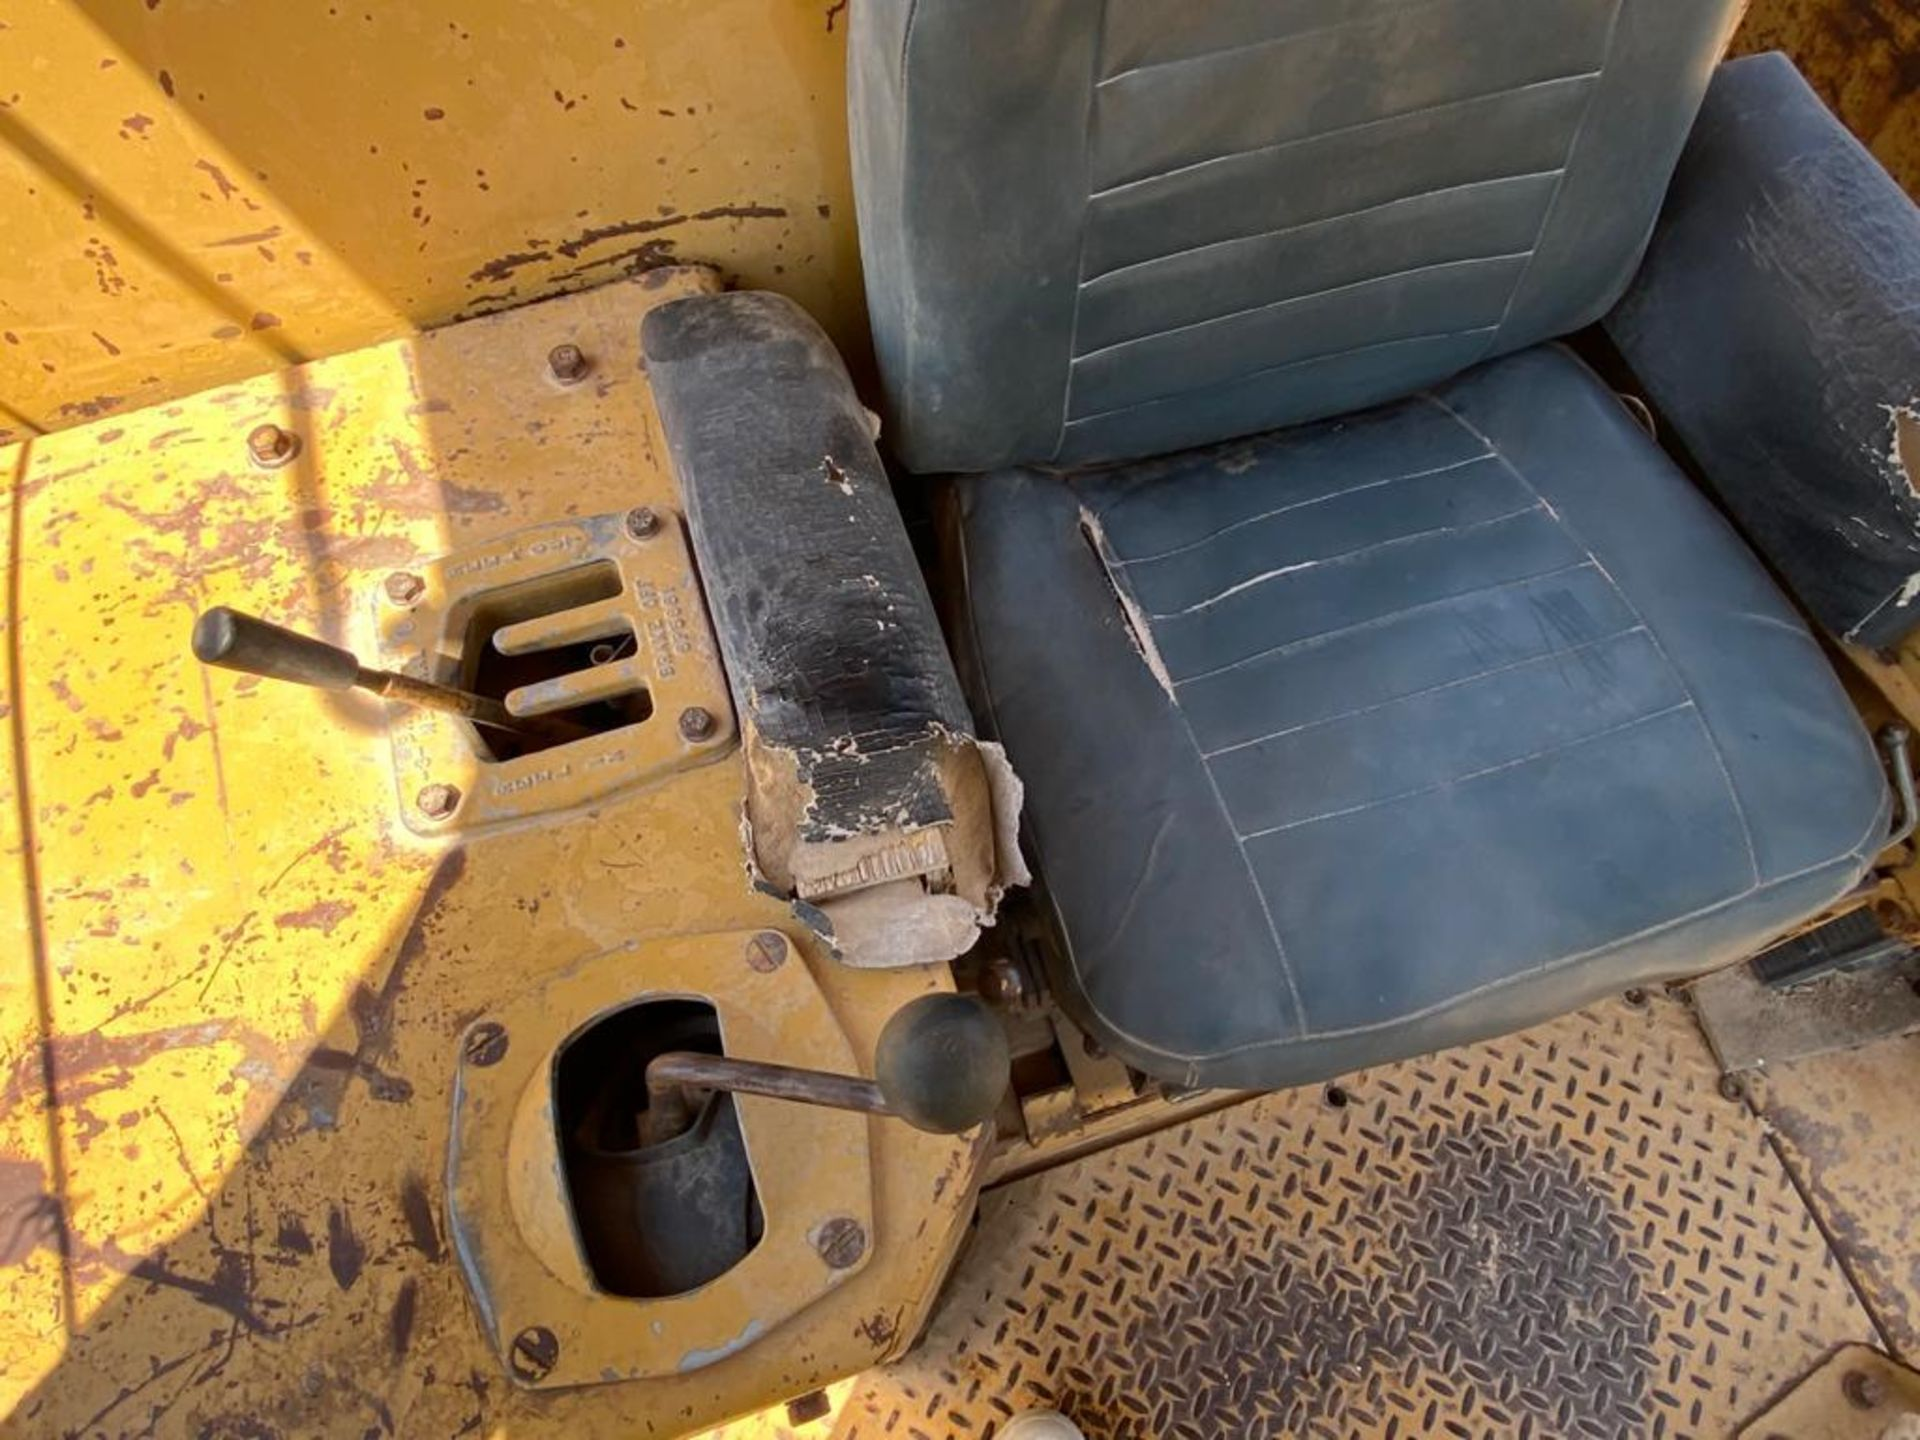 Caterpillar D7G Bulldozer, Serial number 92V5897, Diesel motor - Image 42 of 48